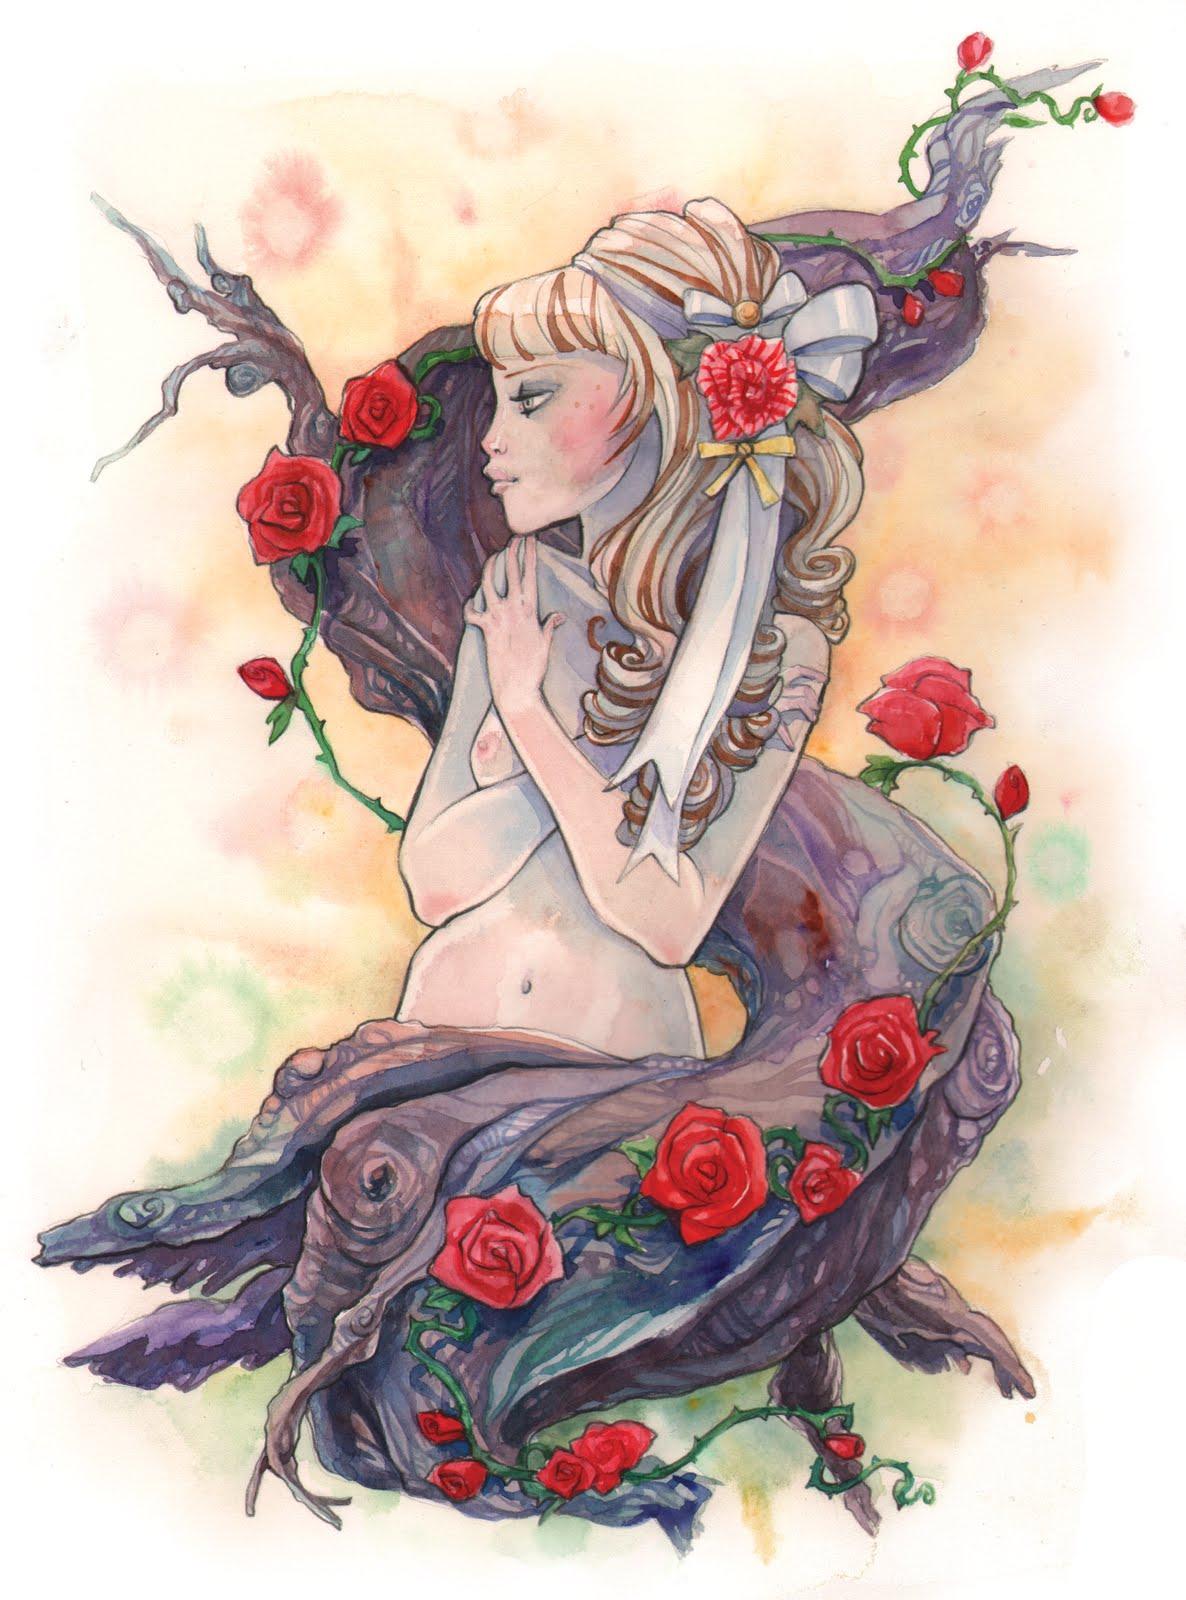 http://1.bp.blogspot.com/_sNiaZ86lfwo/TUjuvHNOHDI/AAAAAAAAAFg/s38hlrsPb_M/s1600/TreeVixenDONE.jpg